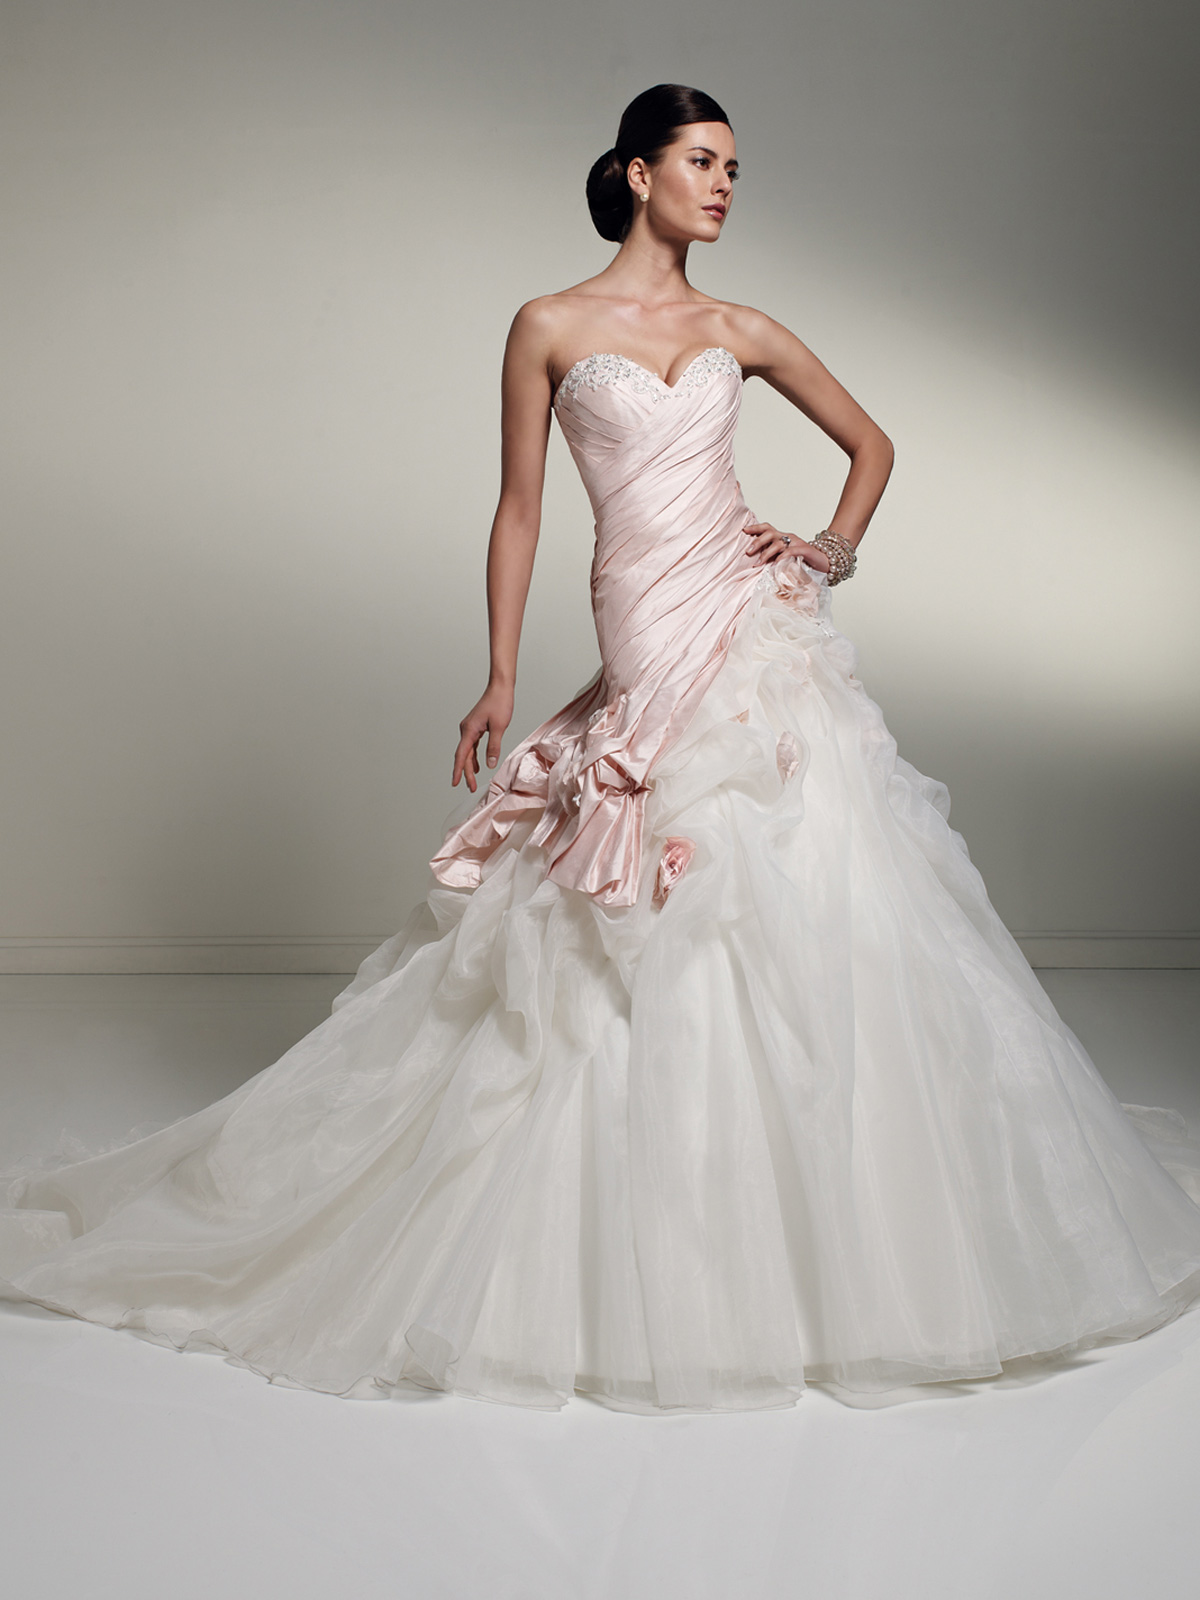 wedding gowns light pink wedding dress pink and white strapless wedding dress